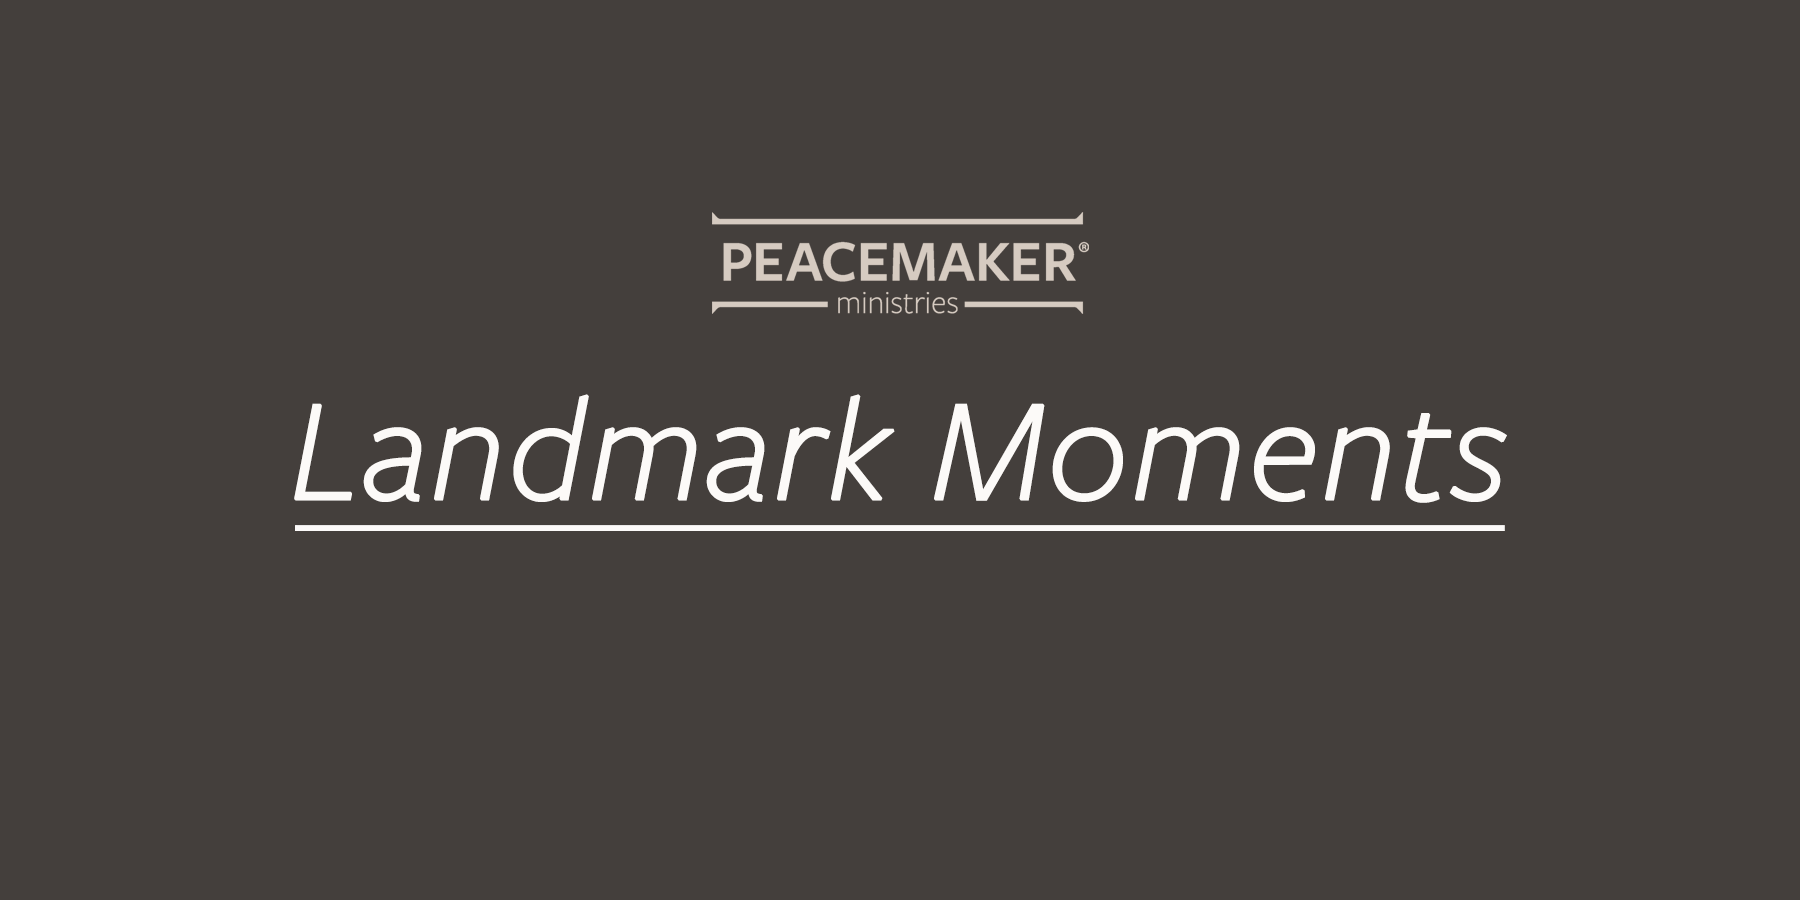 landmark moments